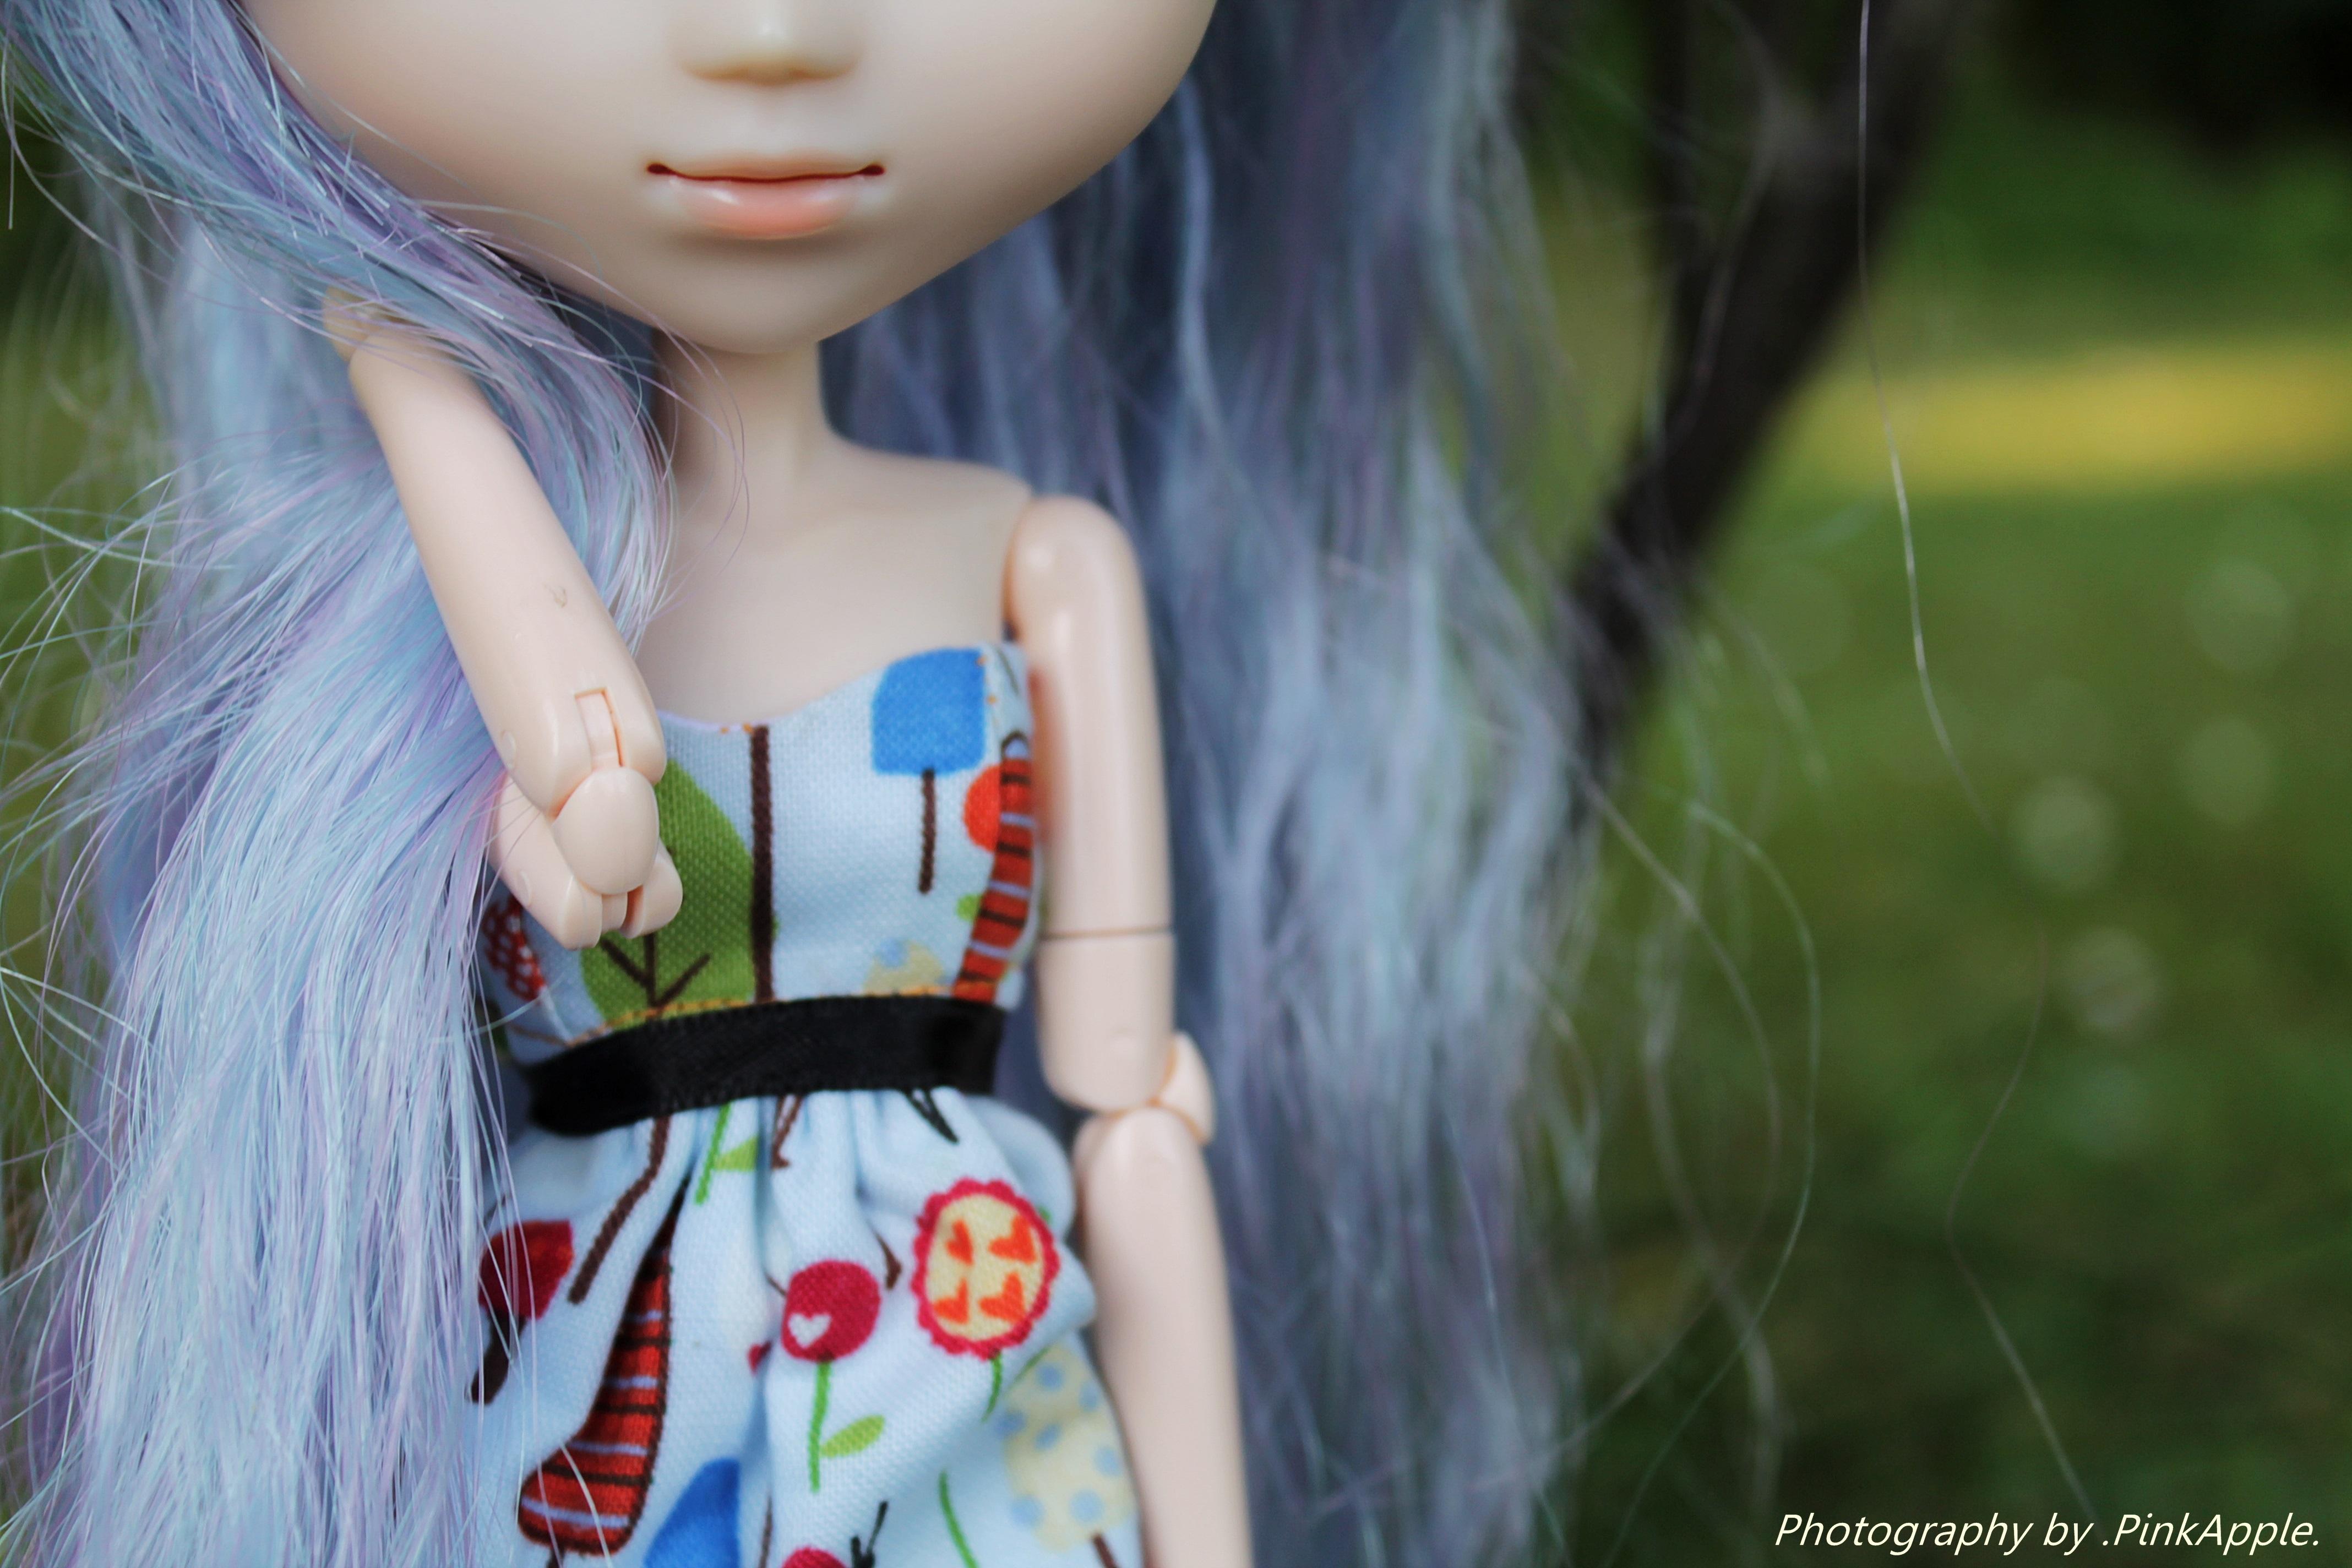 Wallpaper Mata Anime Cinta Gaun Biru Mainan Boneka Neo Angelique Bunga Imut Gadis Manis Canoneos1100d Alur Pullip Junplanning Teguran